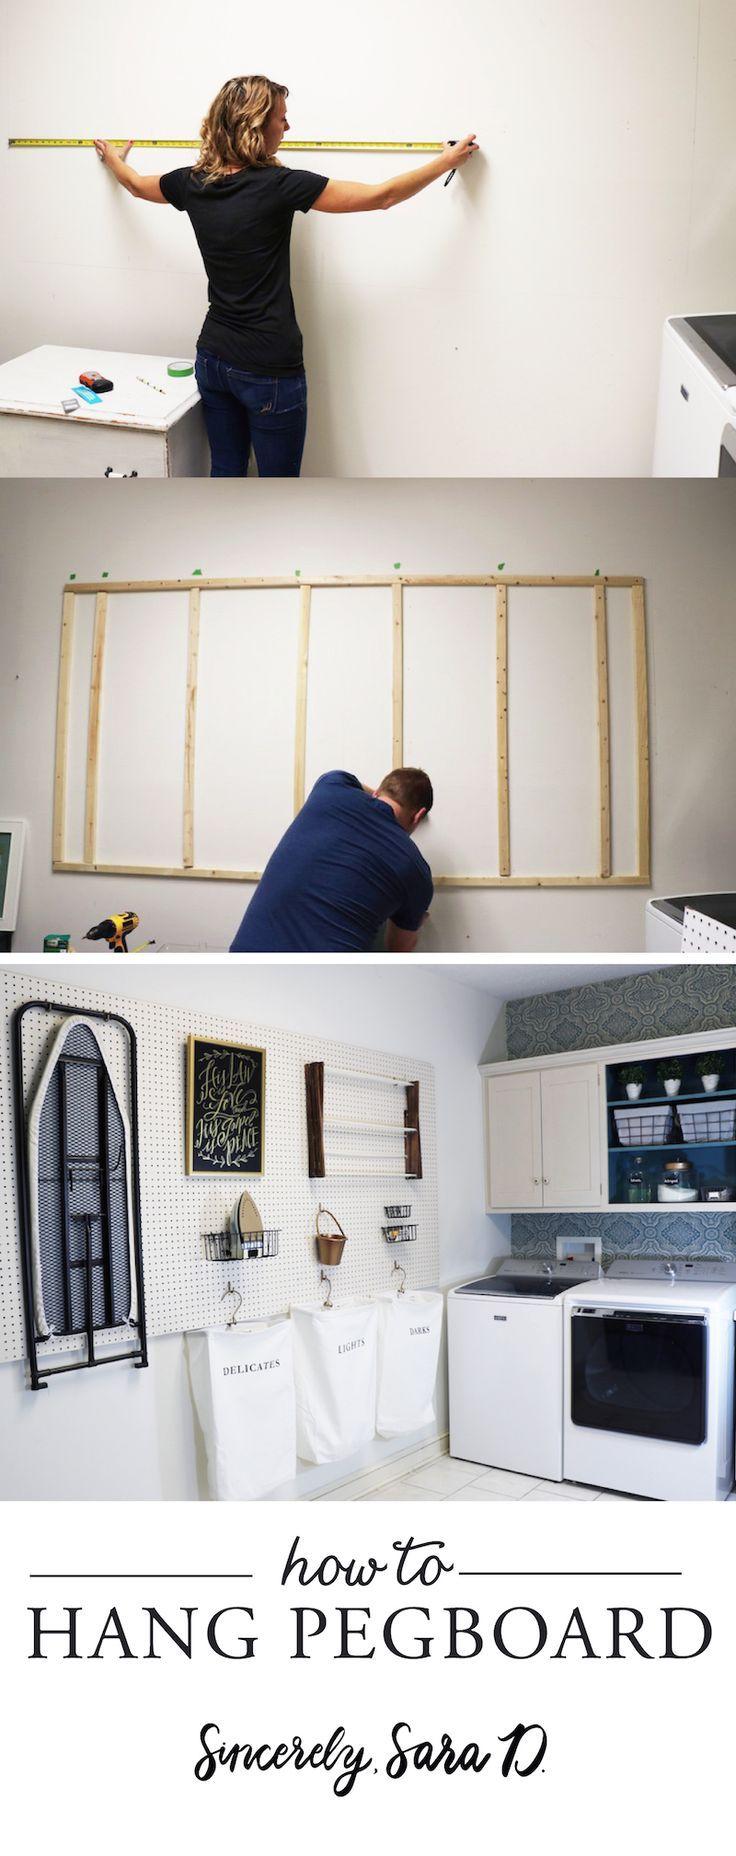 DIY Wäscherei Zimmer Pegboard zimmer wascherei pegboard